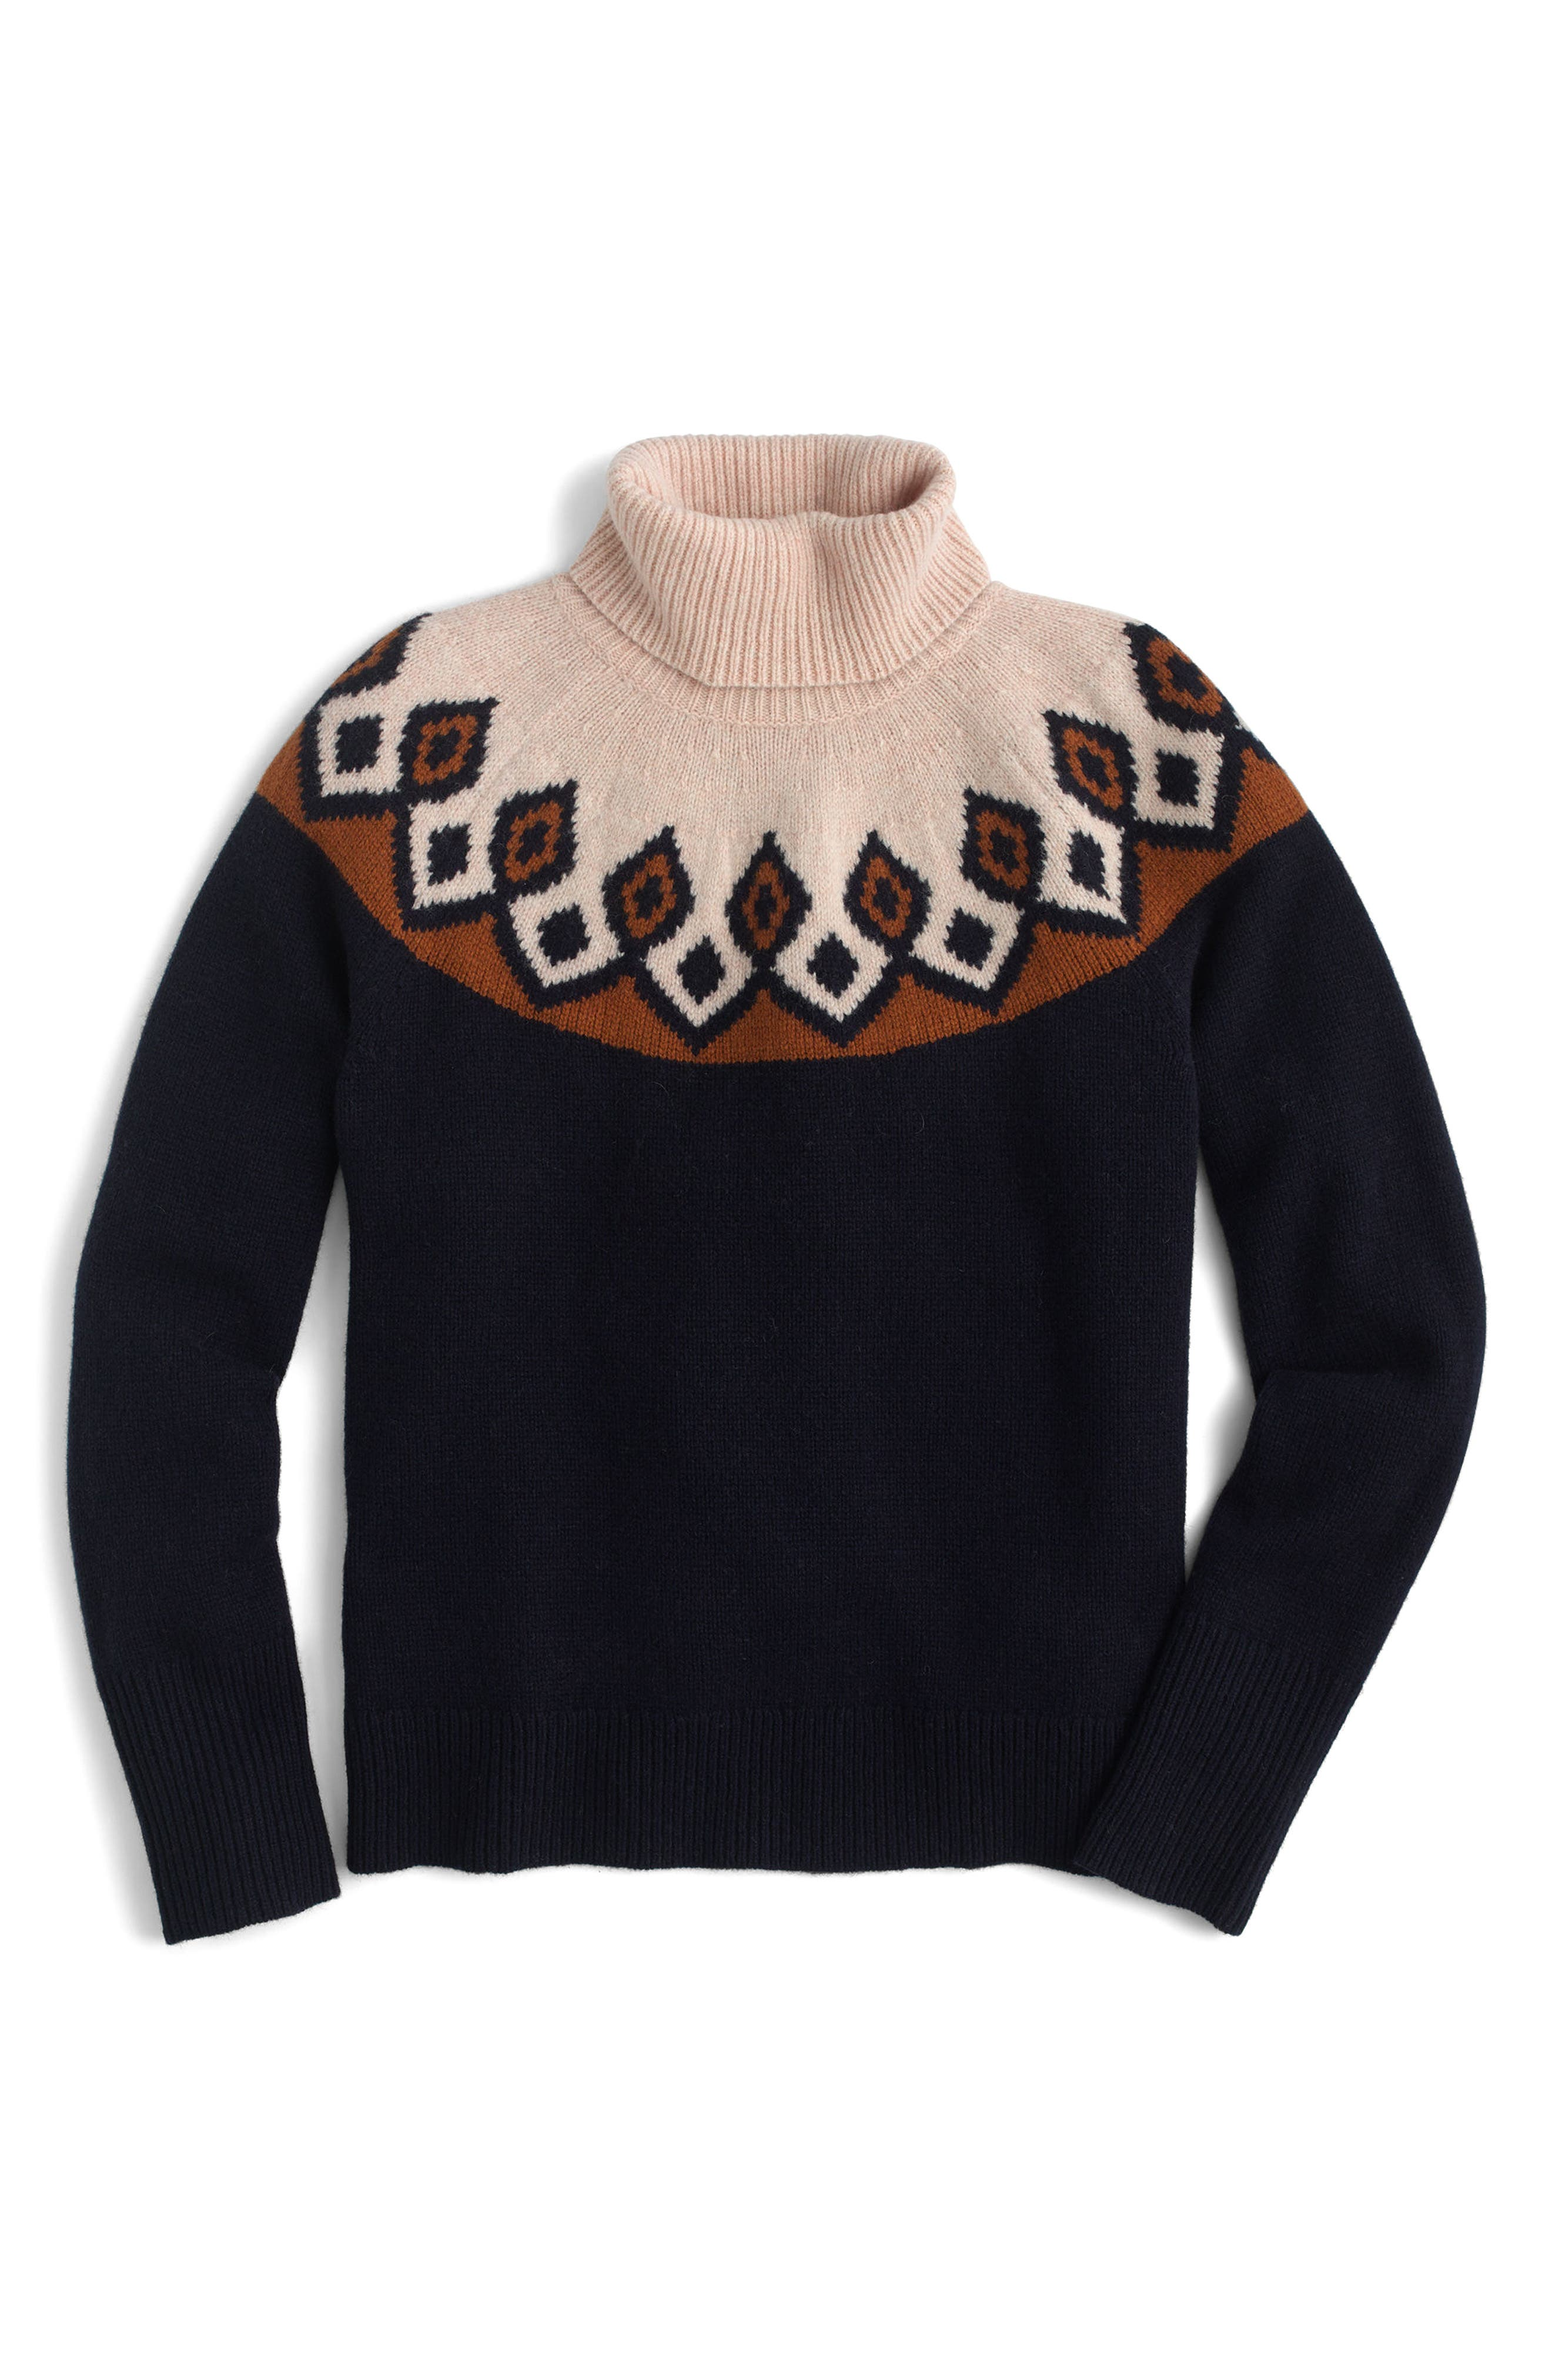 Ambrose Fair Isle Merino Wool Sweater,                             Alternate thumbnail 3, color,                             Navy/ Peach